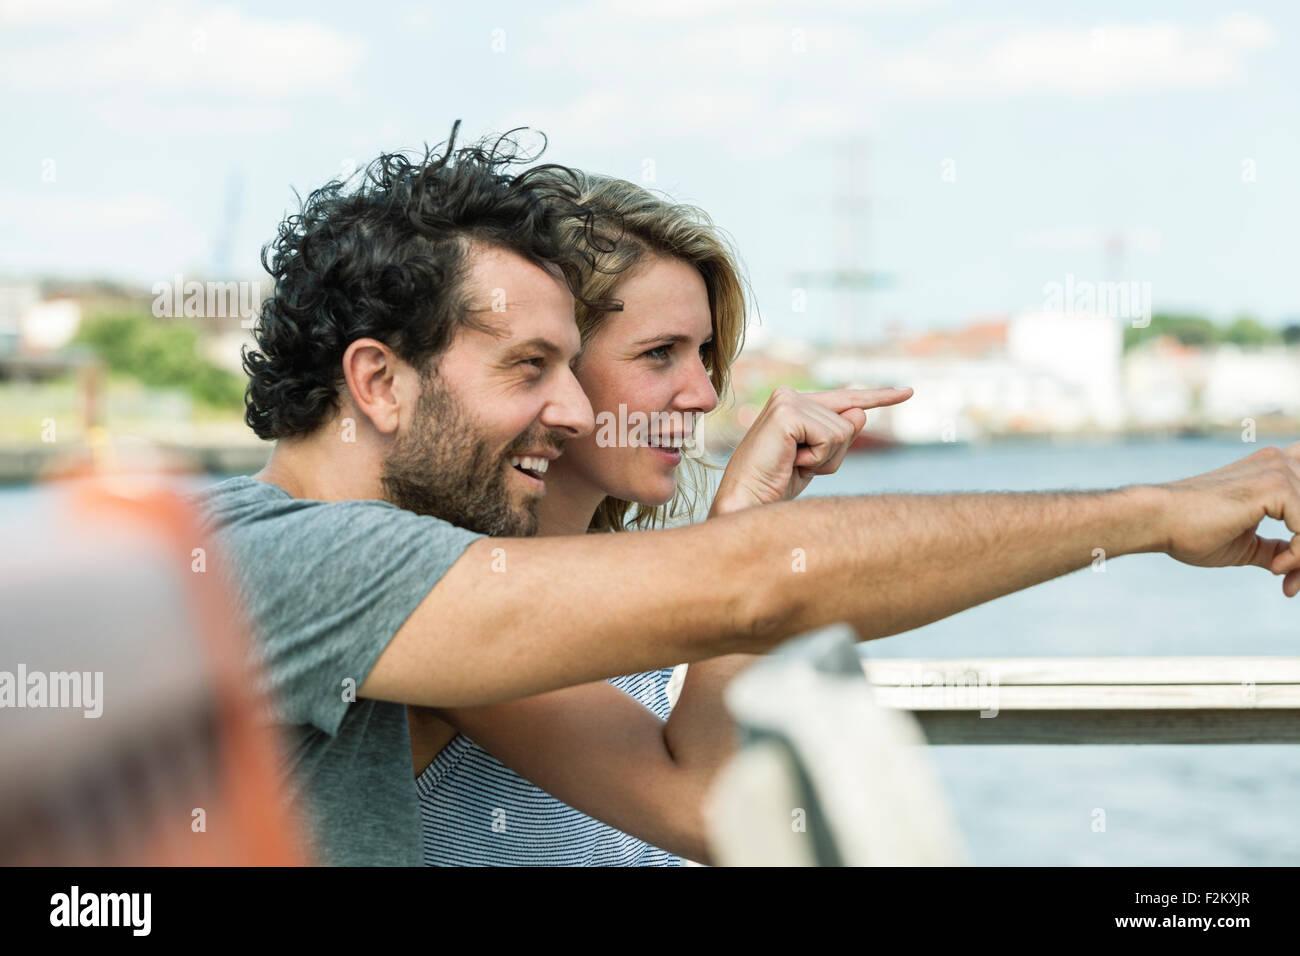 Germany, Luebeck, smiling couple pointing at something - Stock Image